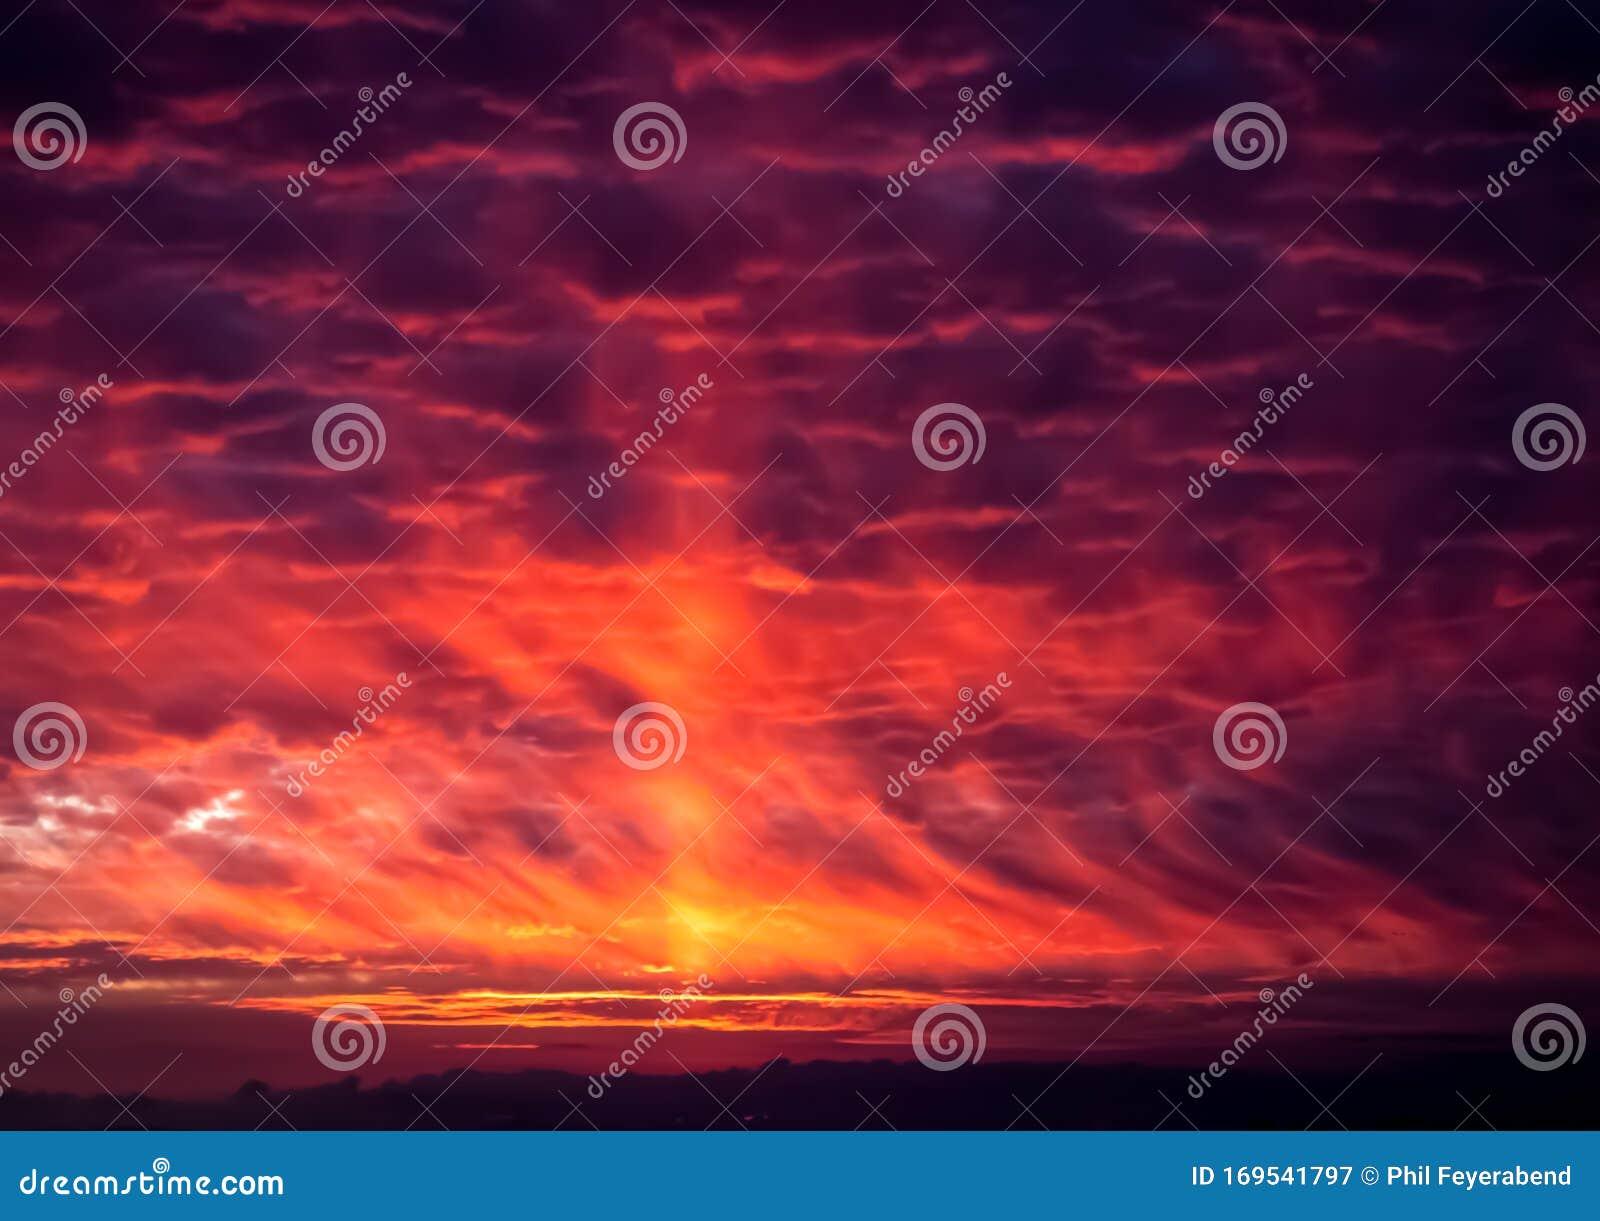 Dramatic Orange And Purple Sunset Stock Image Image Of Purple Beautiful 169541797